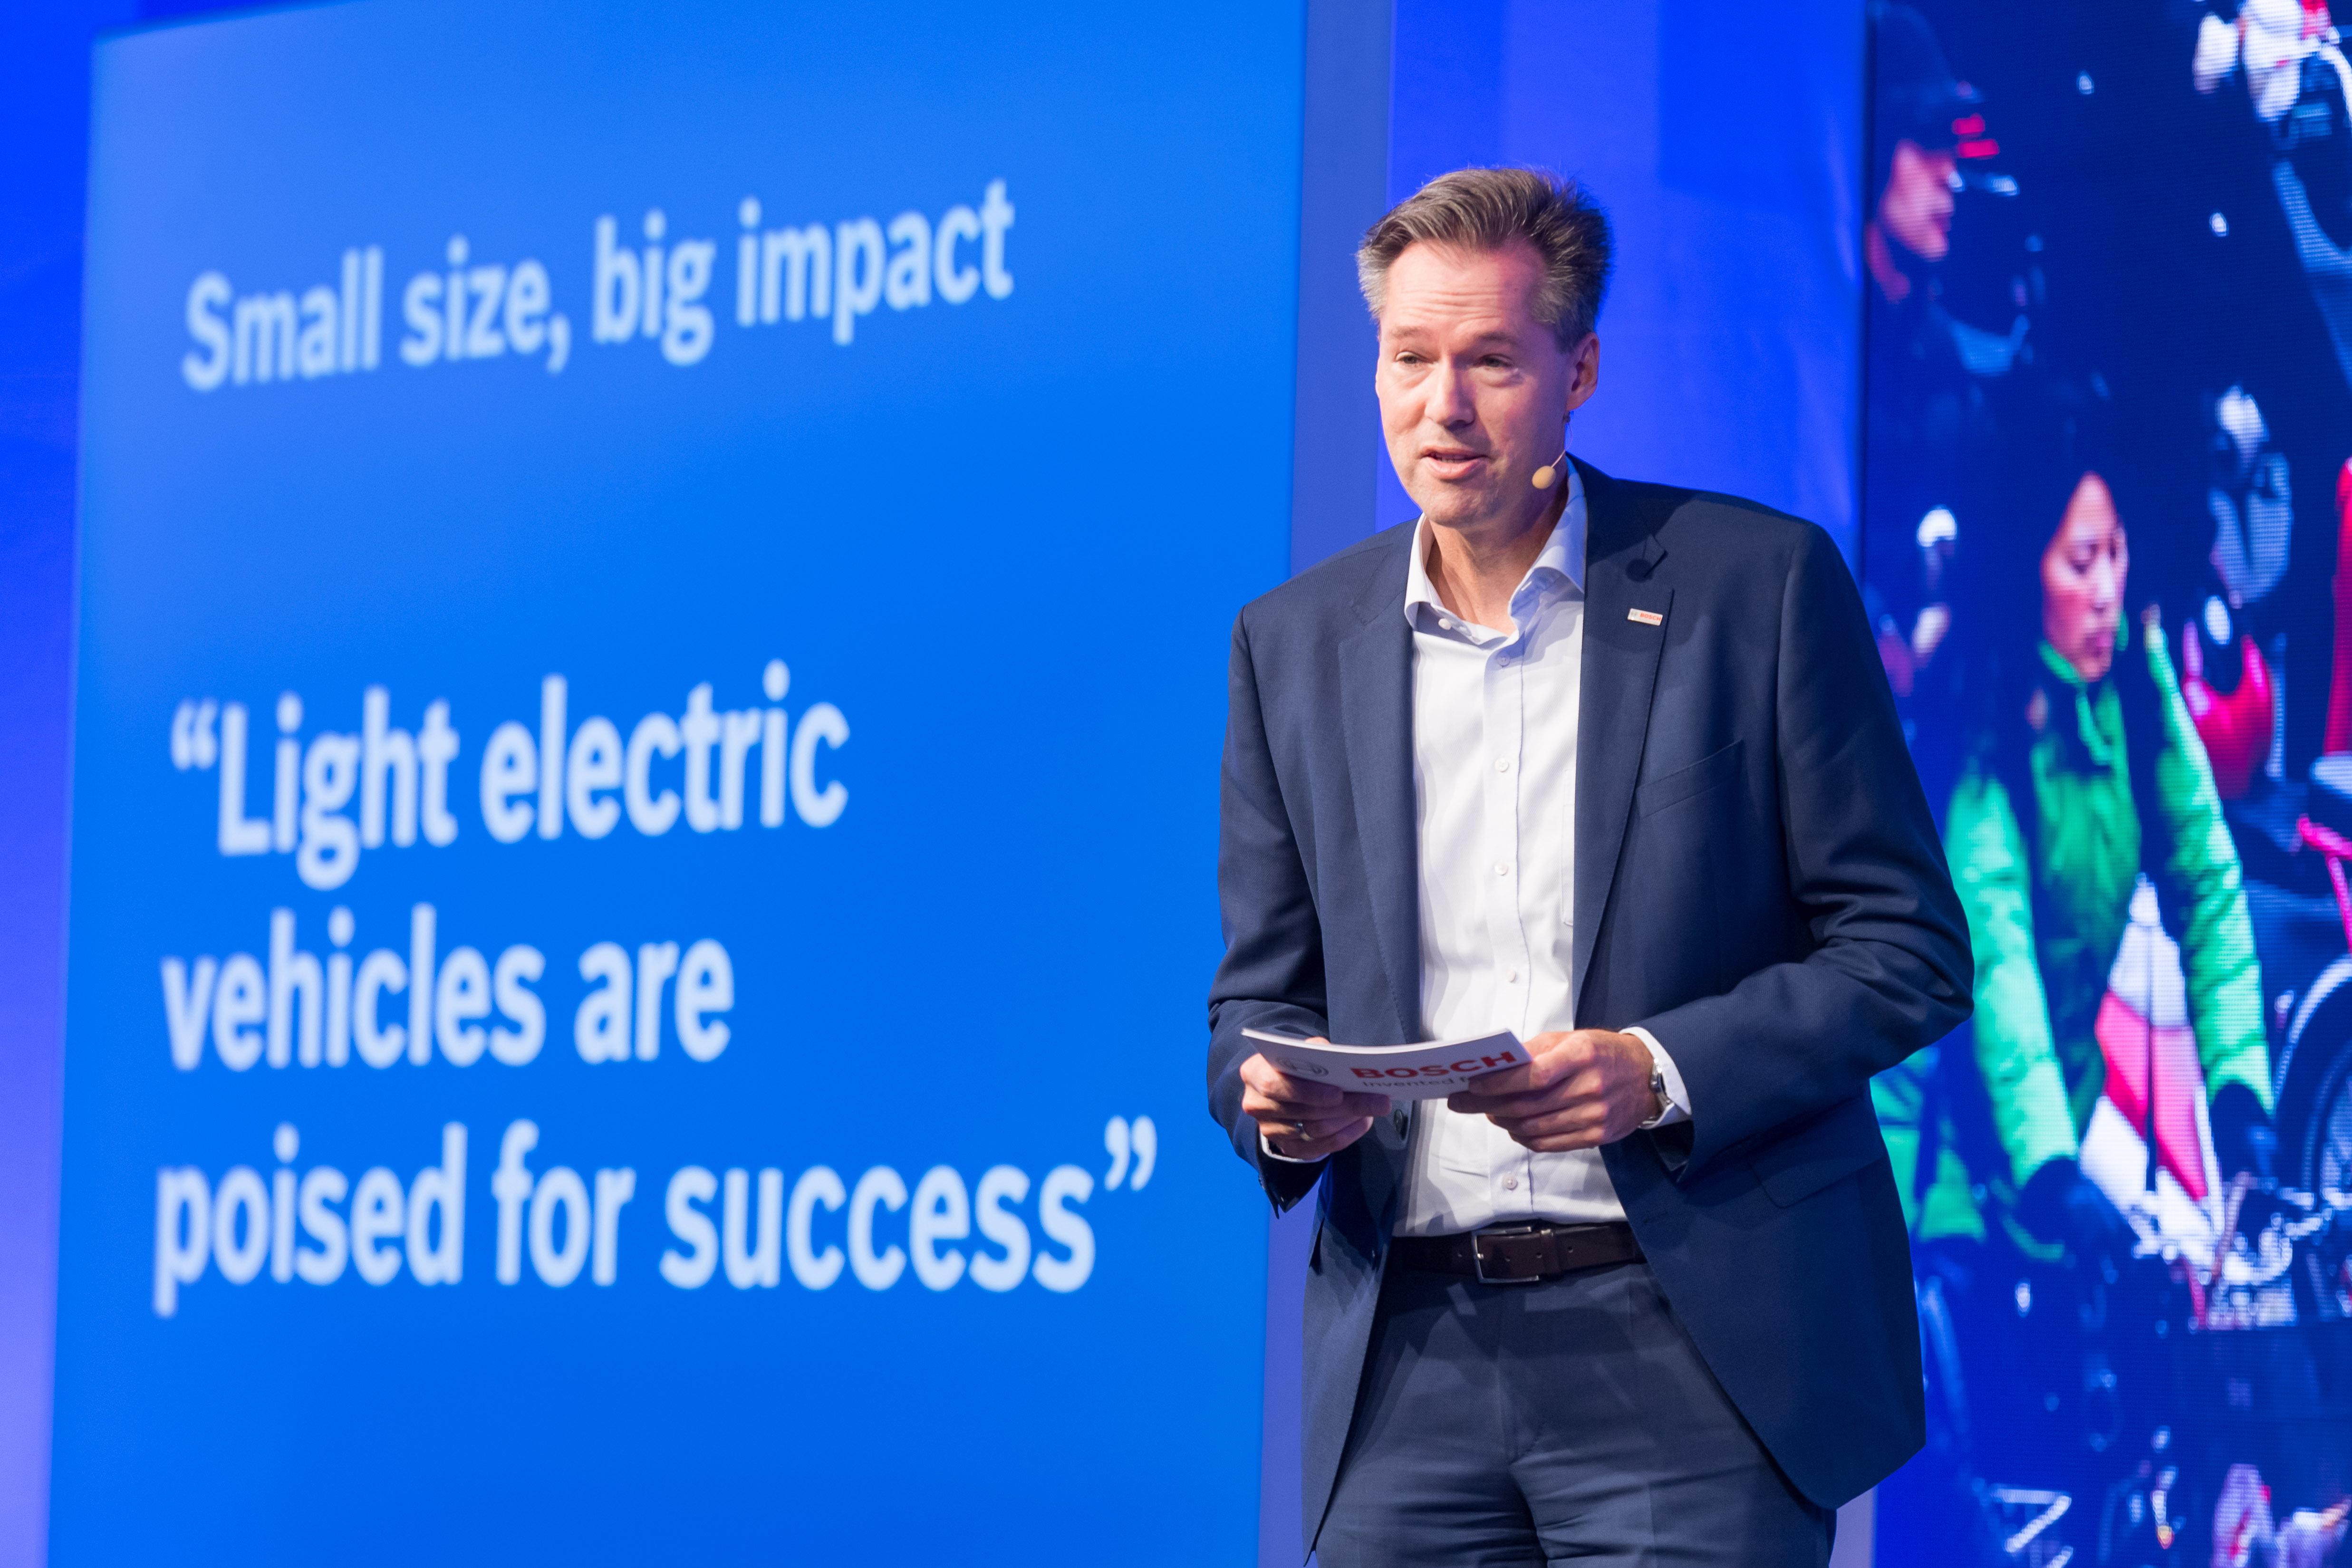 Dr. Markus Heyn, member of the board of management of Robert Bosch GmbH